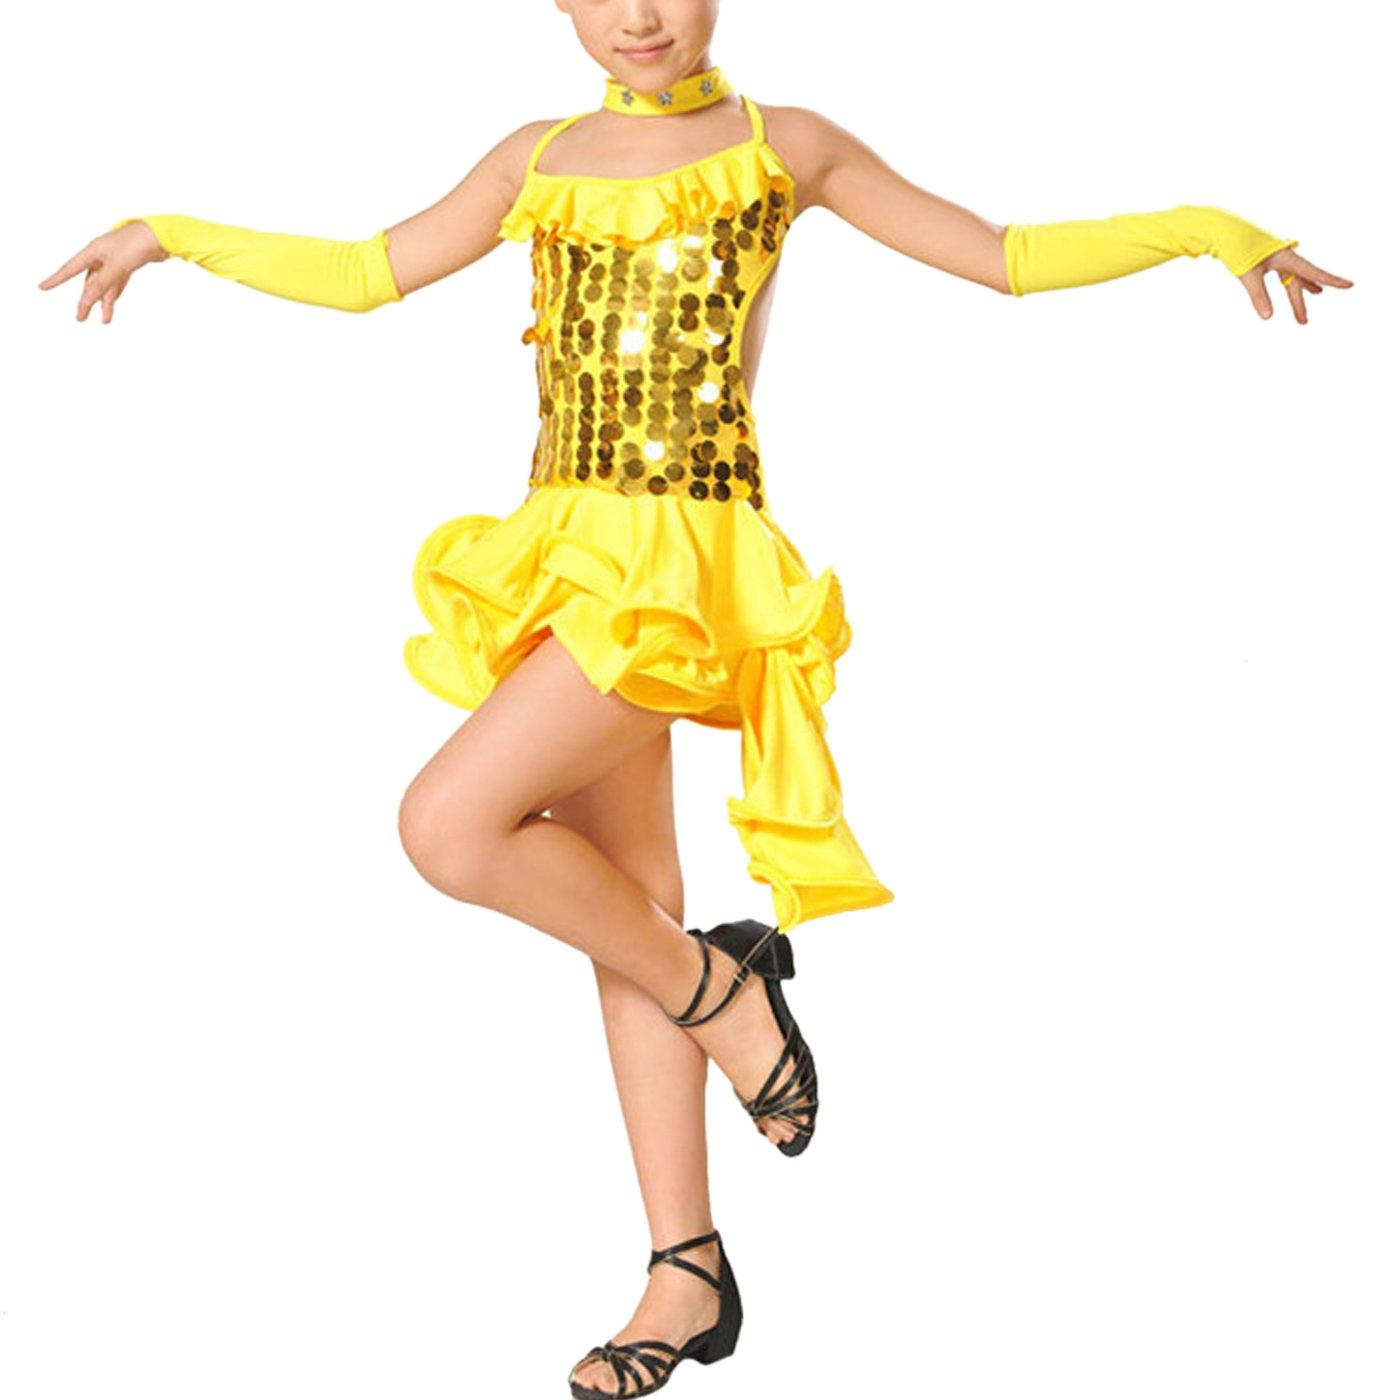 6449ad1edf649 Feoya - Robe Costume Latino Fille Robe Danseuse Salsa Leotard Robe ...